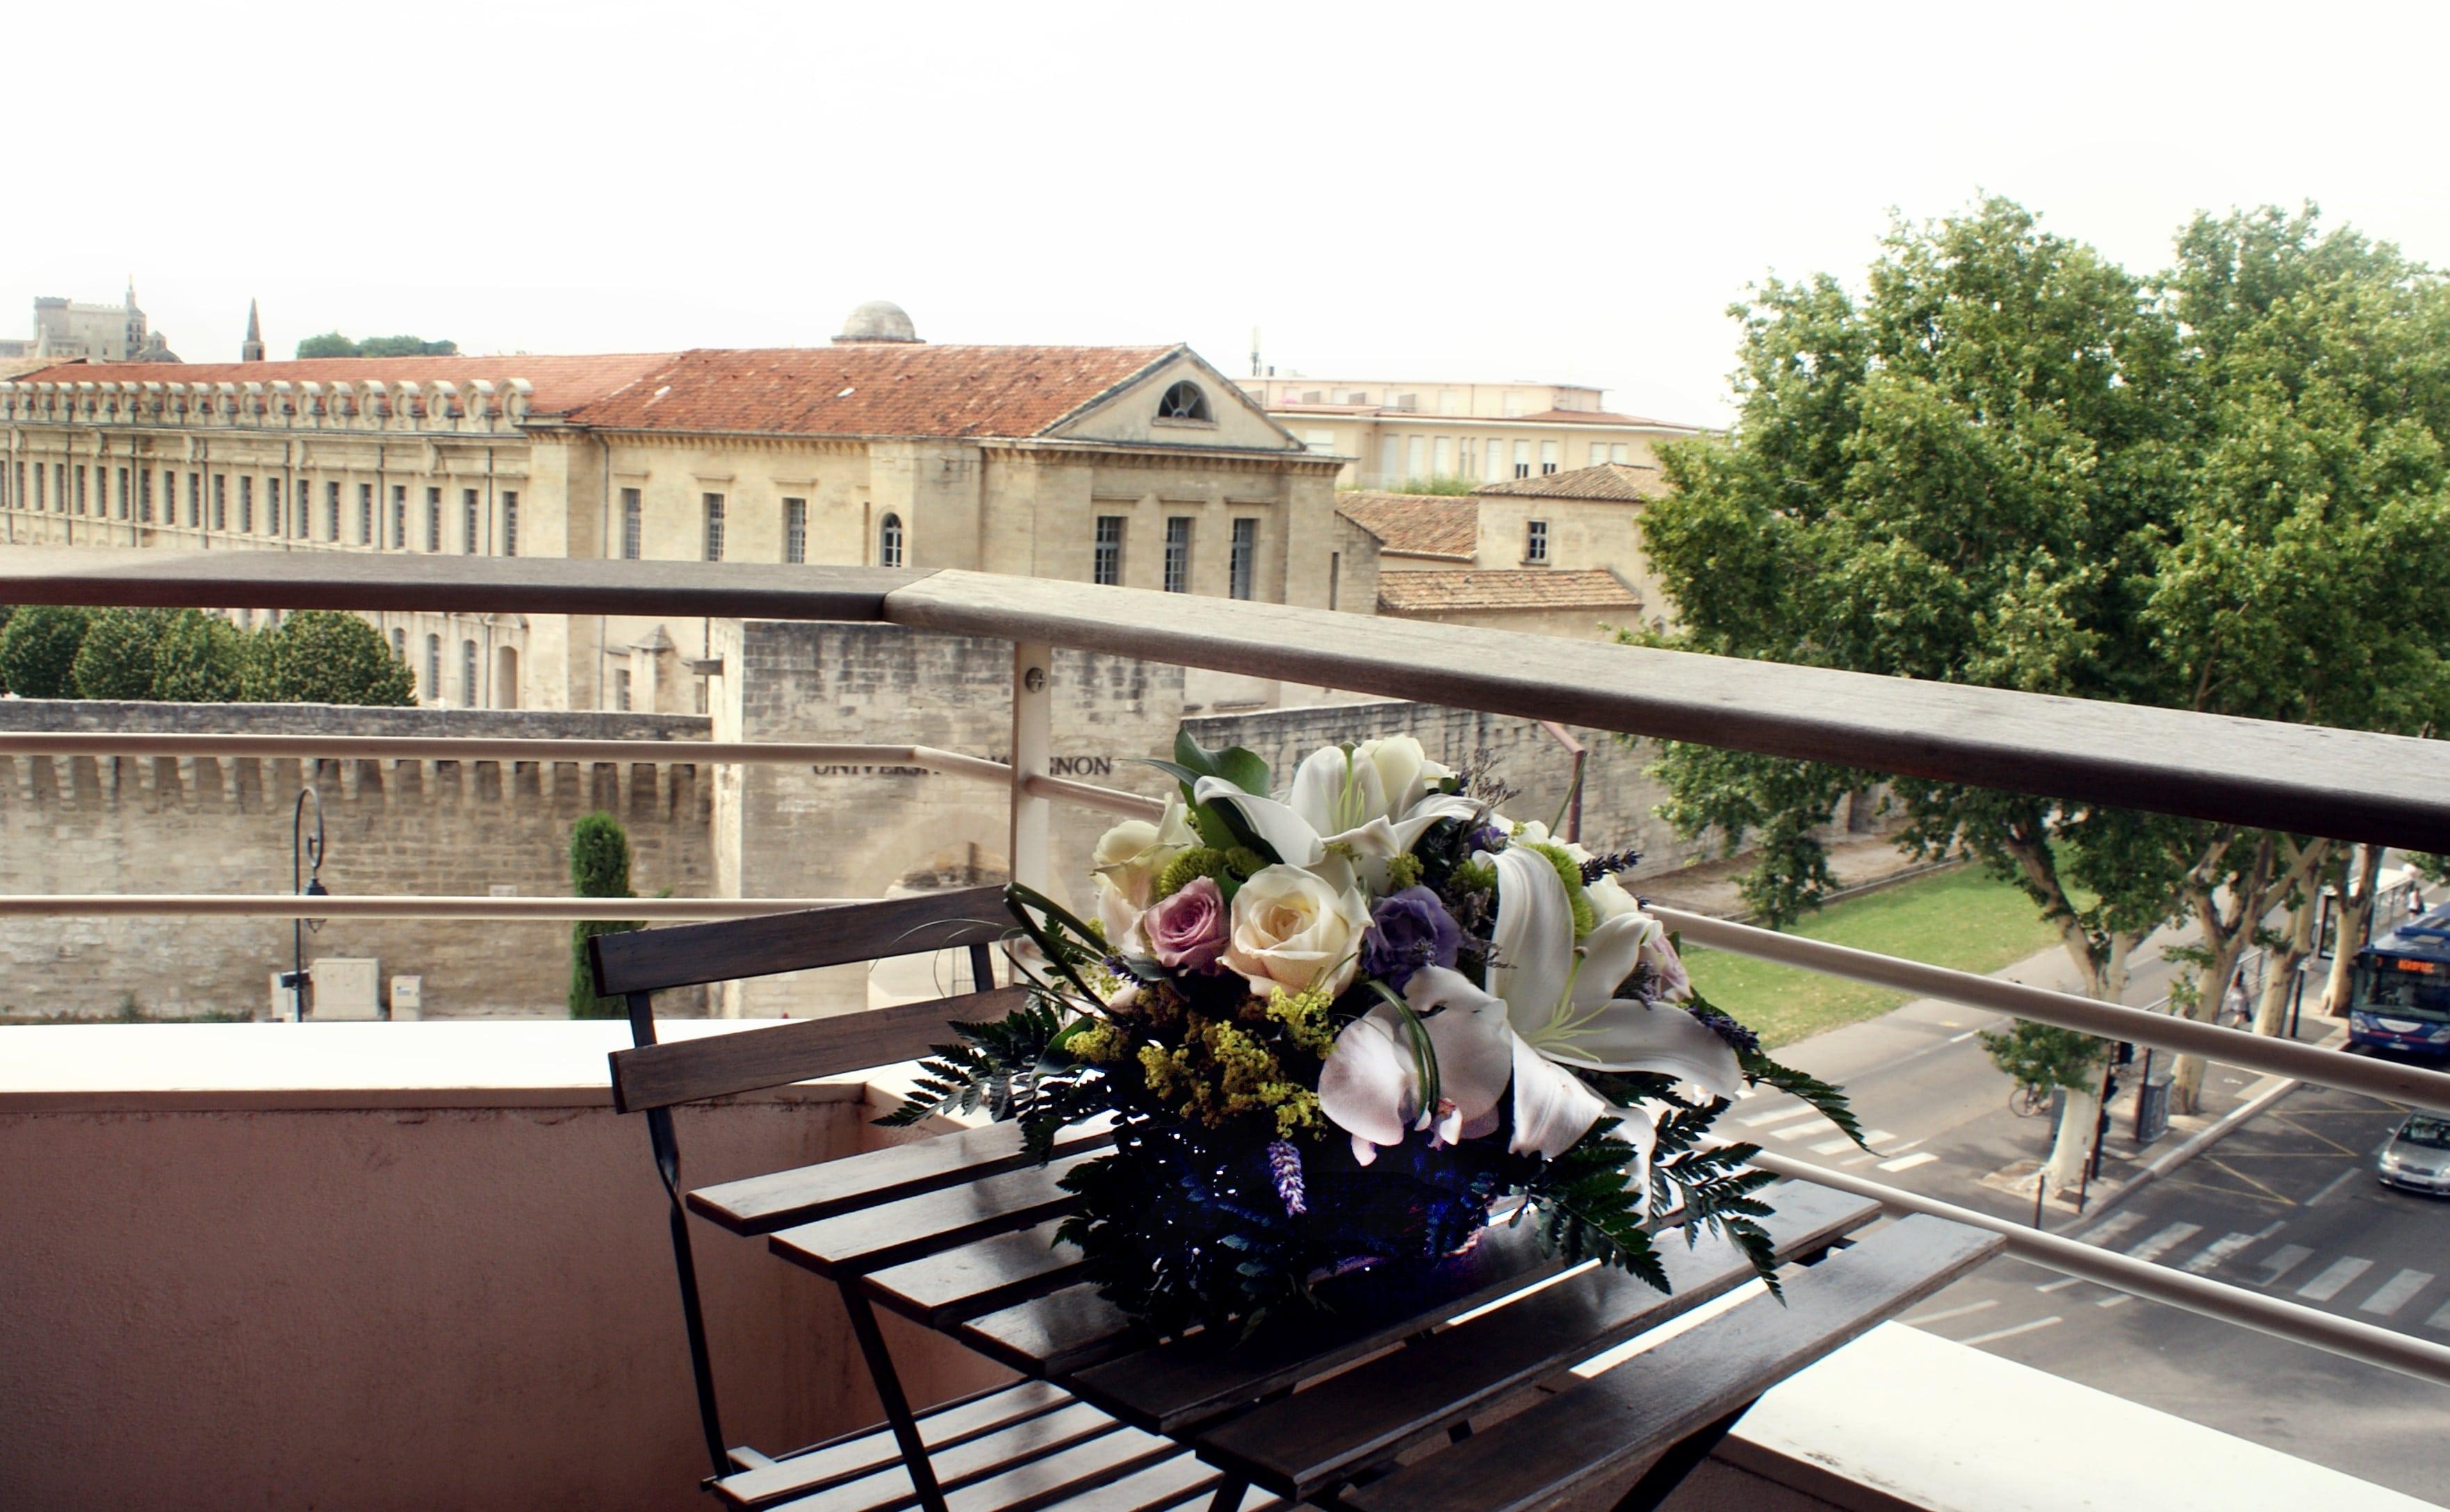 Terrassse appartement hotel vers Avignon